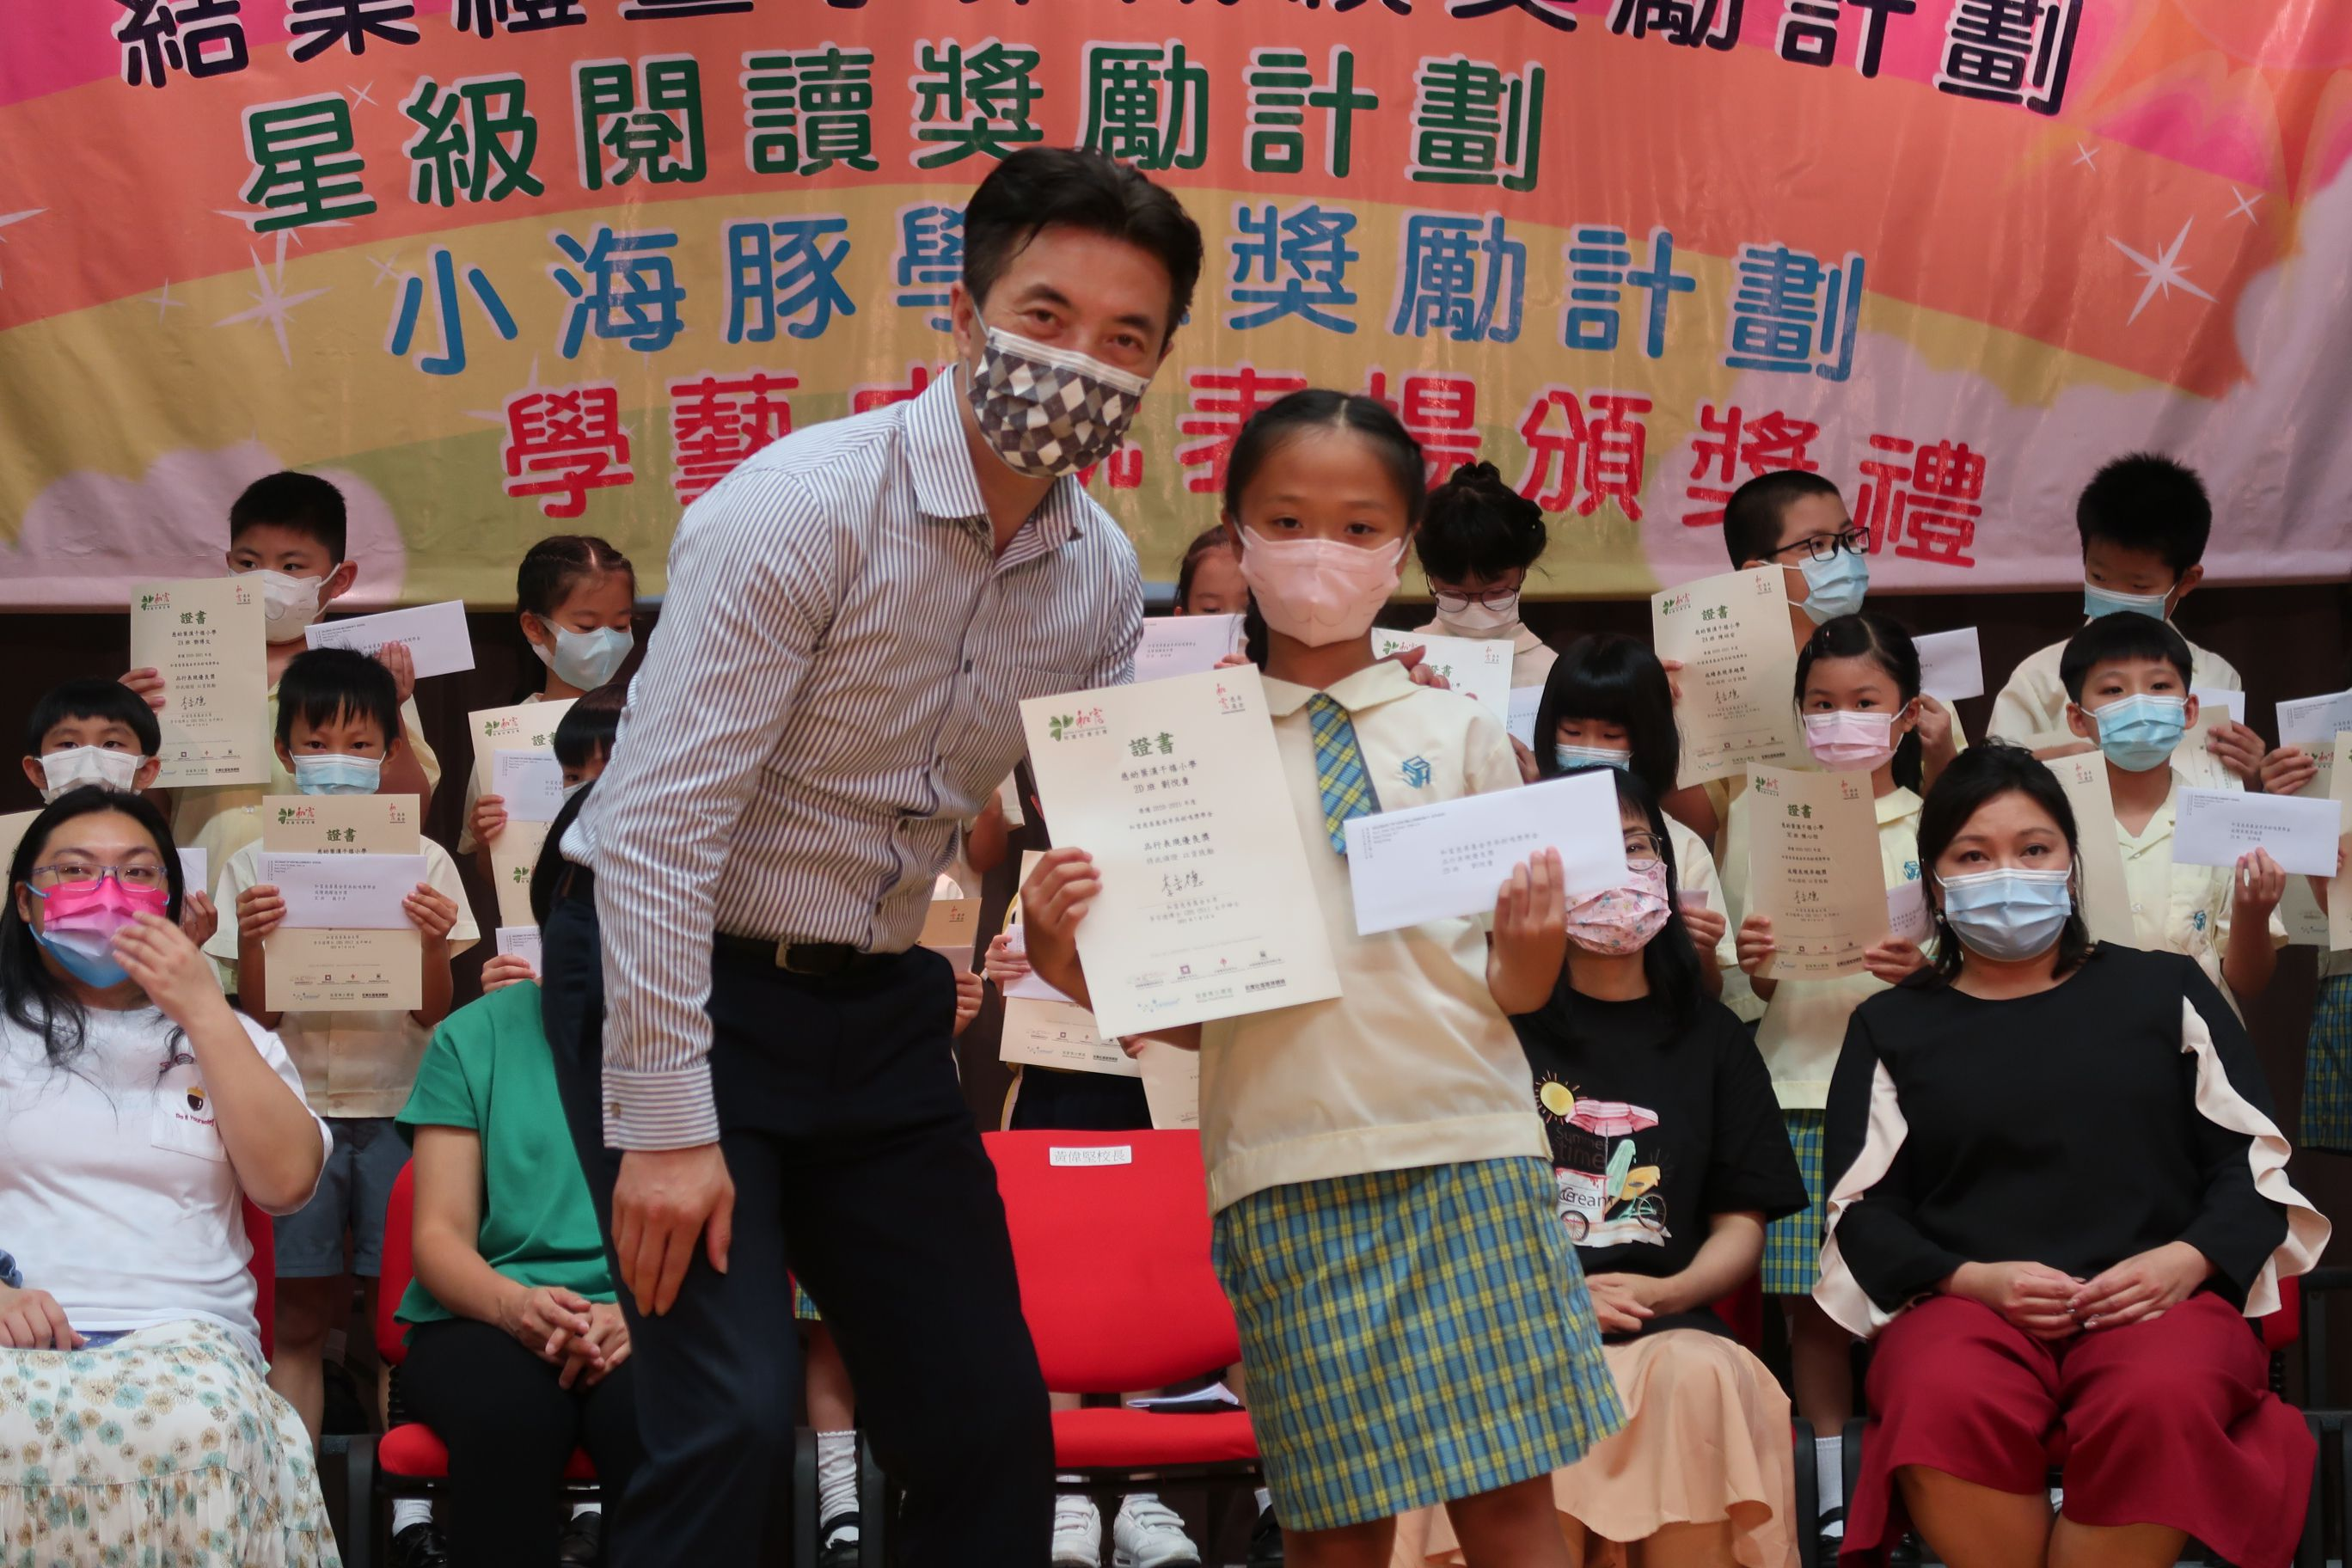 https://syh.edu.hk/sites/default/files/img_5958_1.jpg